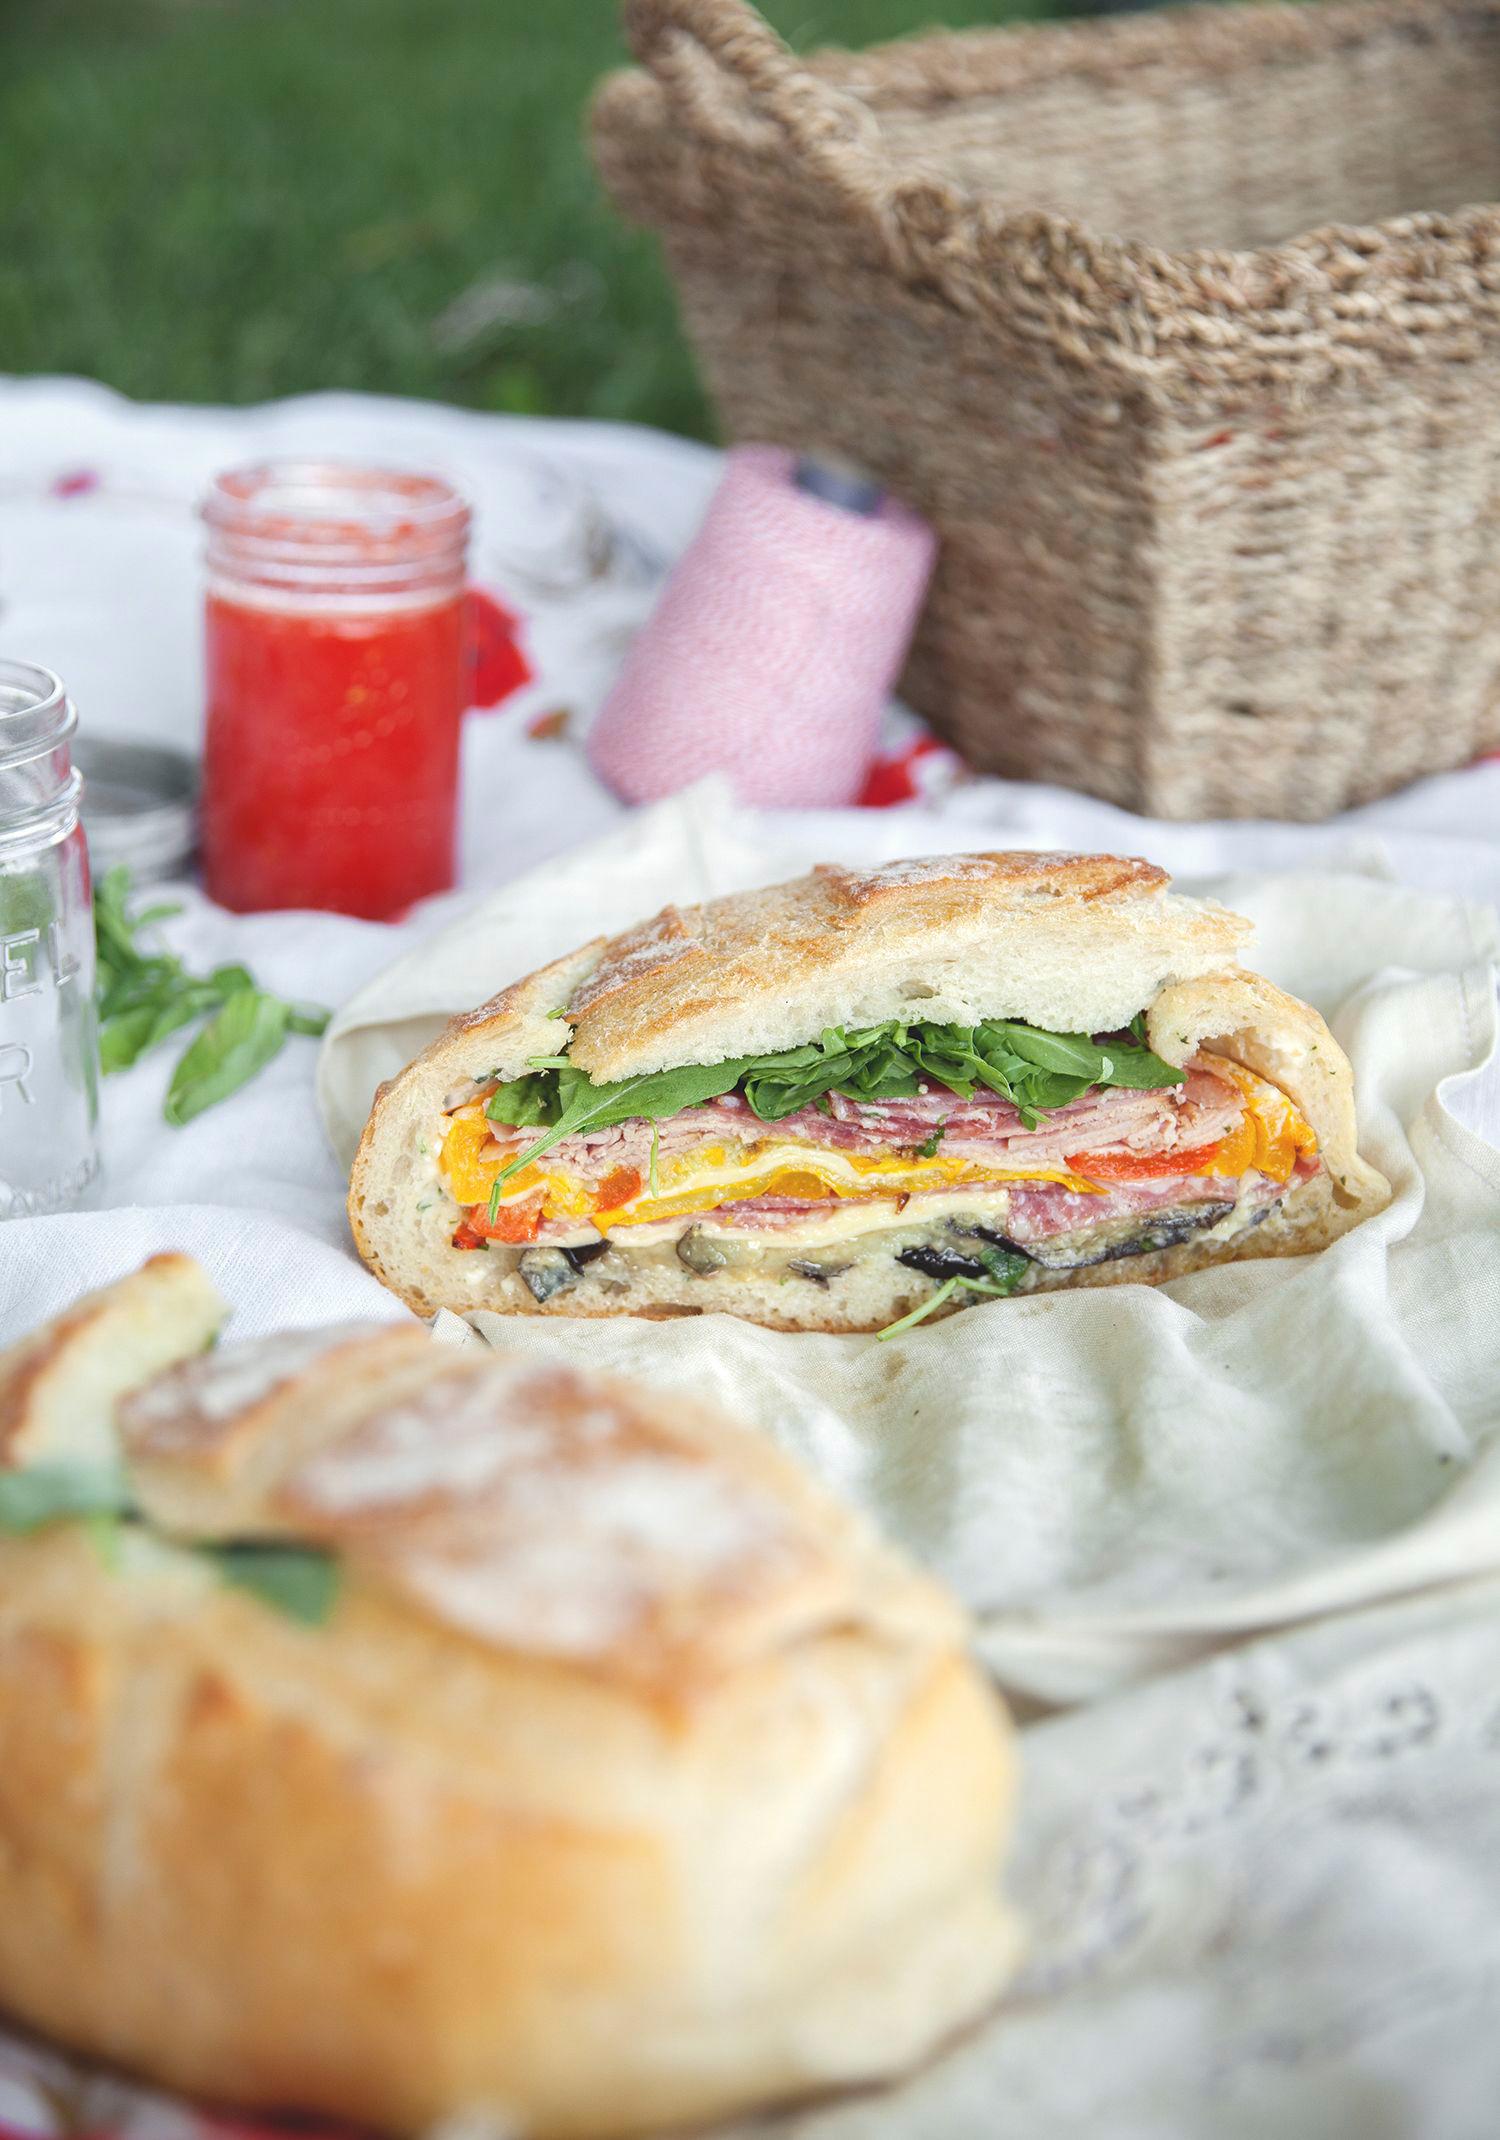 Muffaletta aux légumes grillés & charcuteries